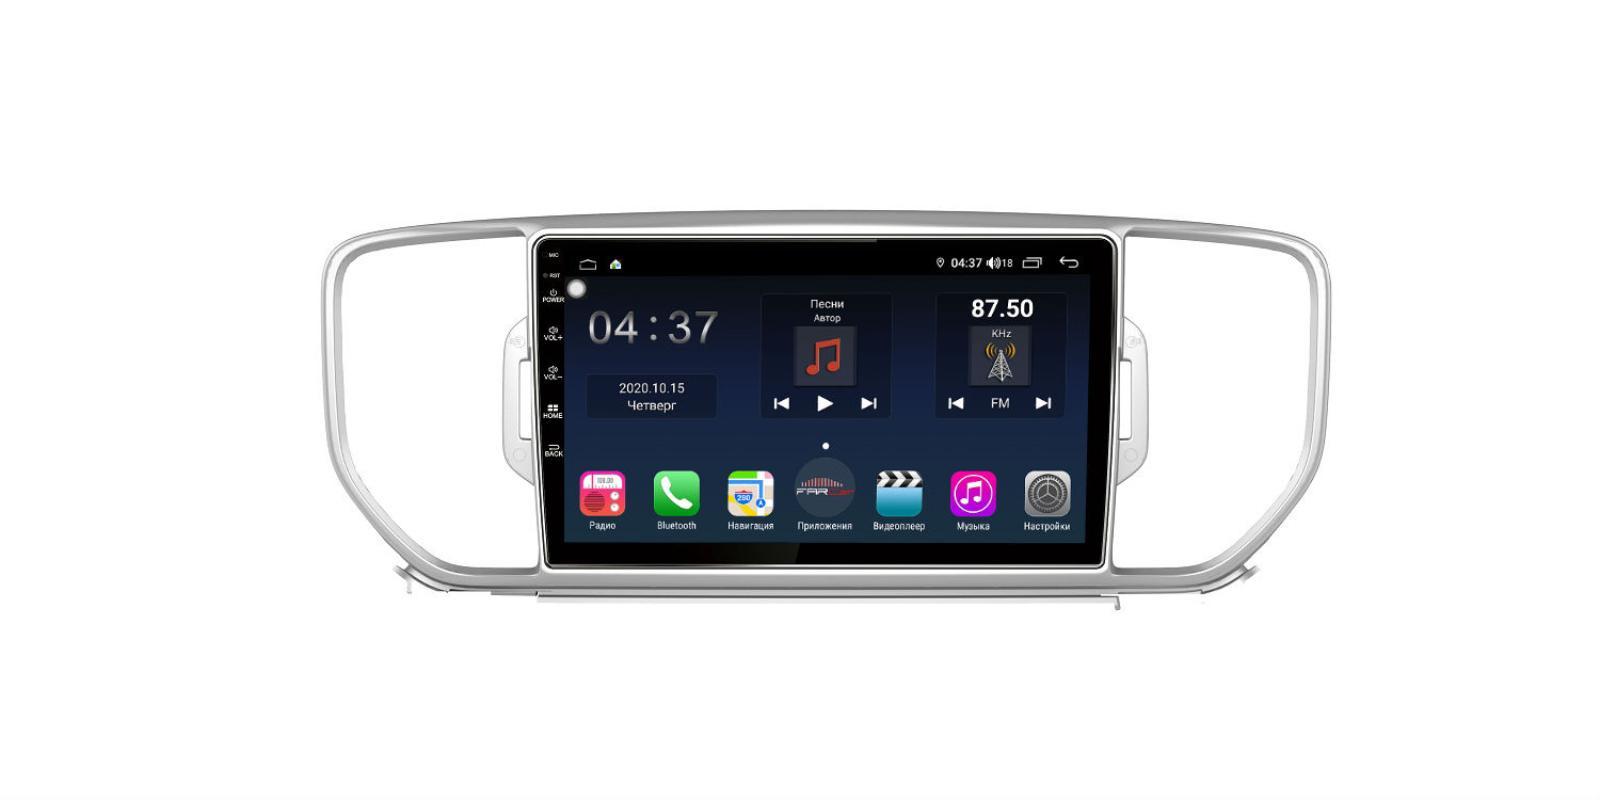 Штатная магнитола FarCar s400 для KIA Sportage на Android (TG576R) (+ Камера заднего вида в подарок!)